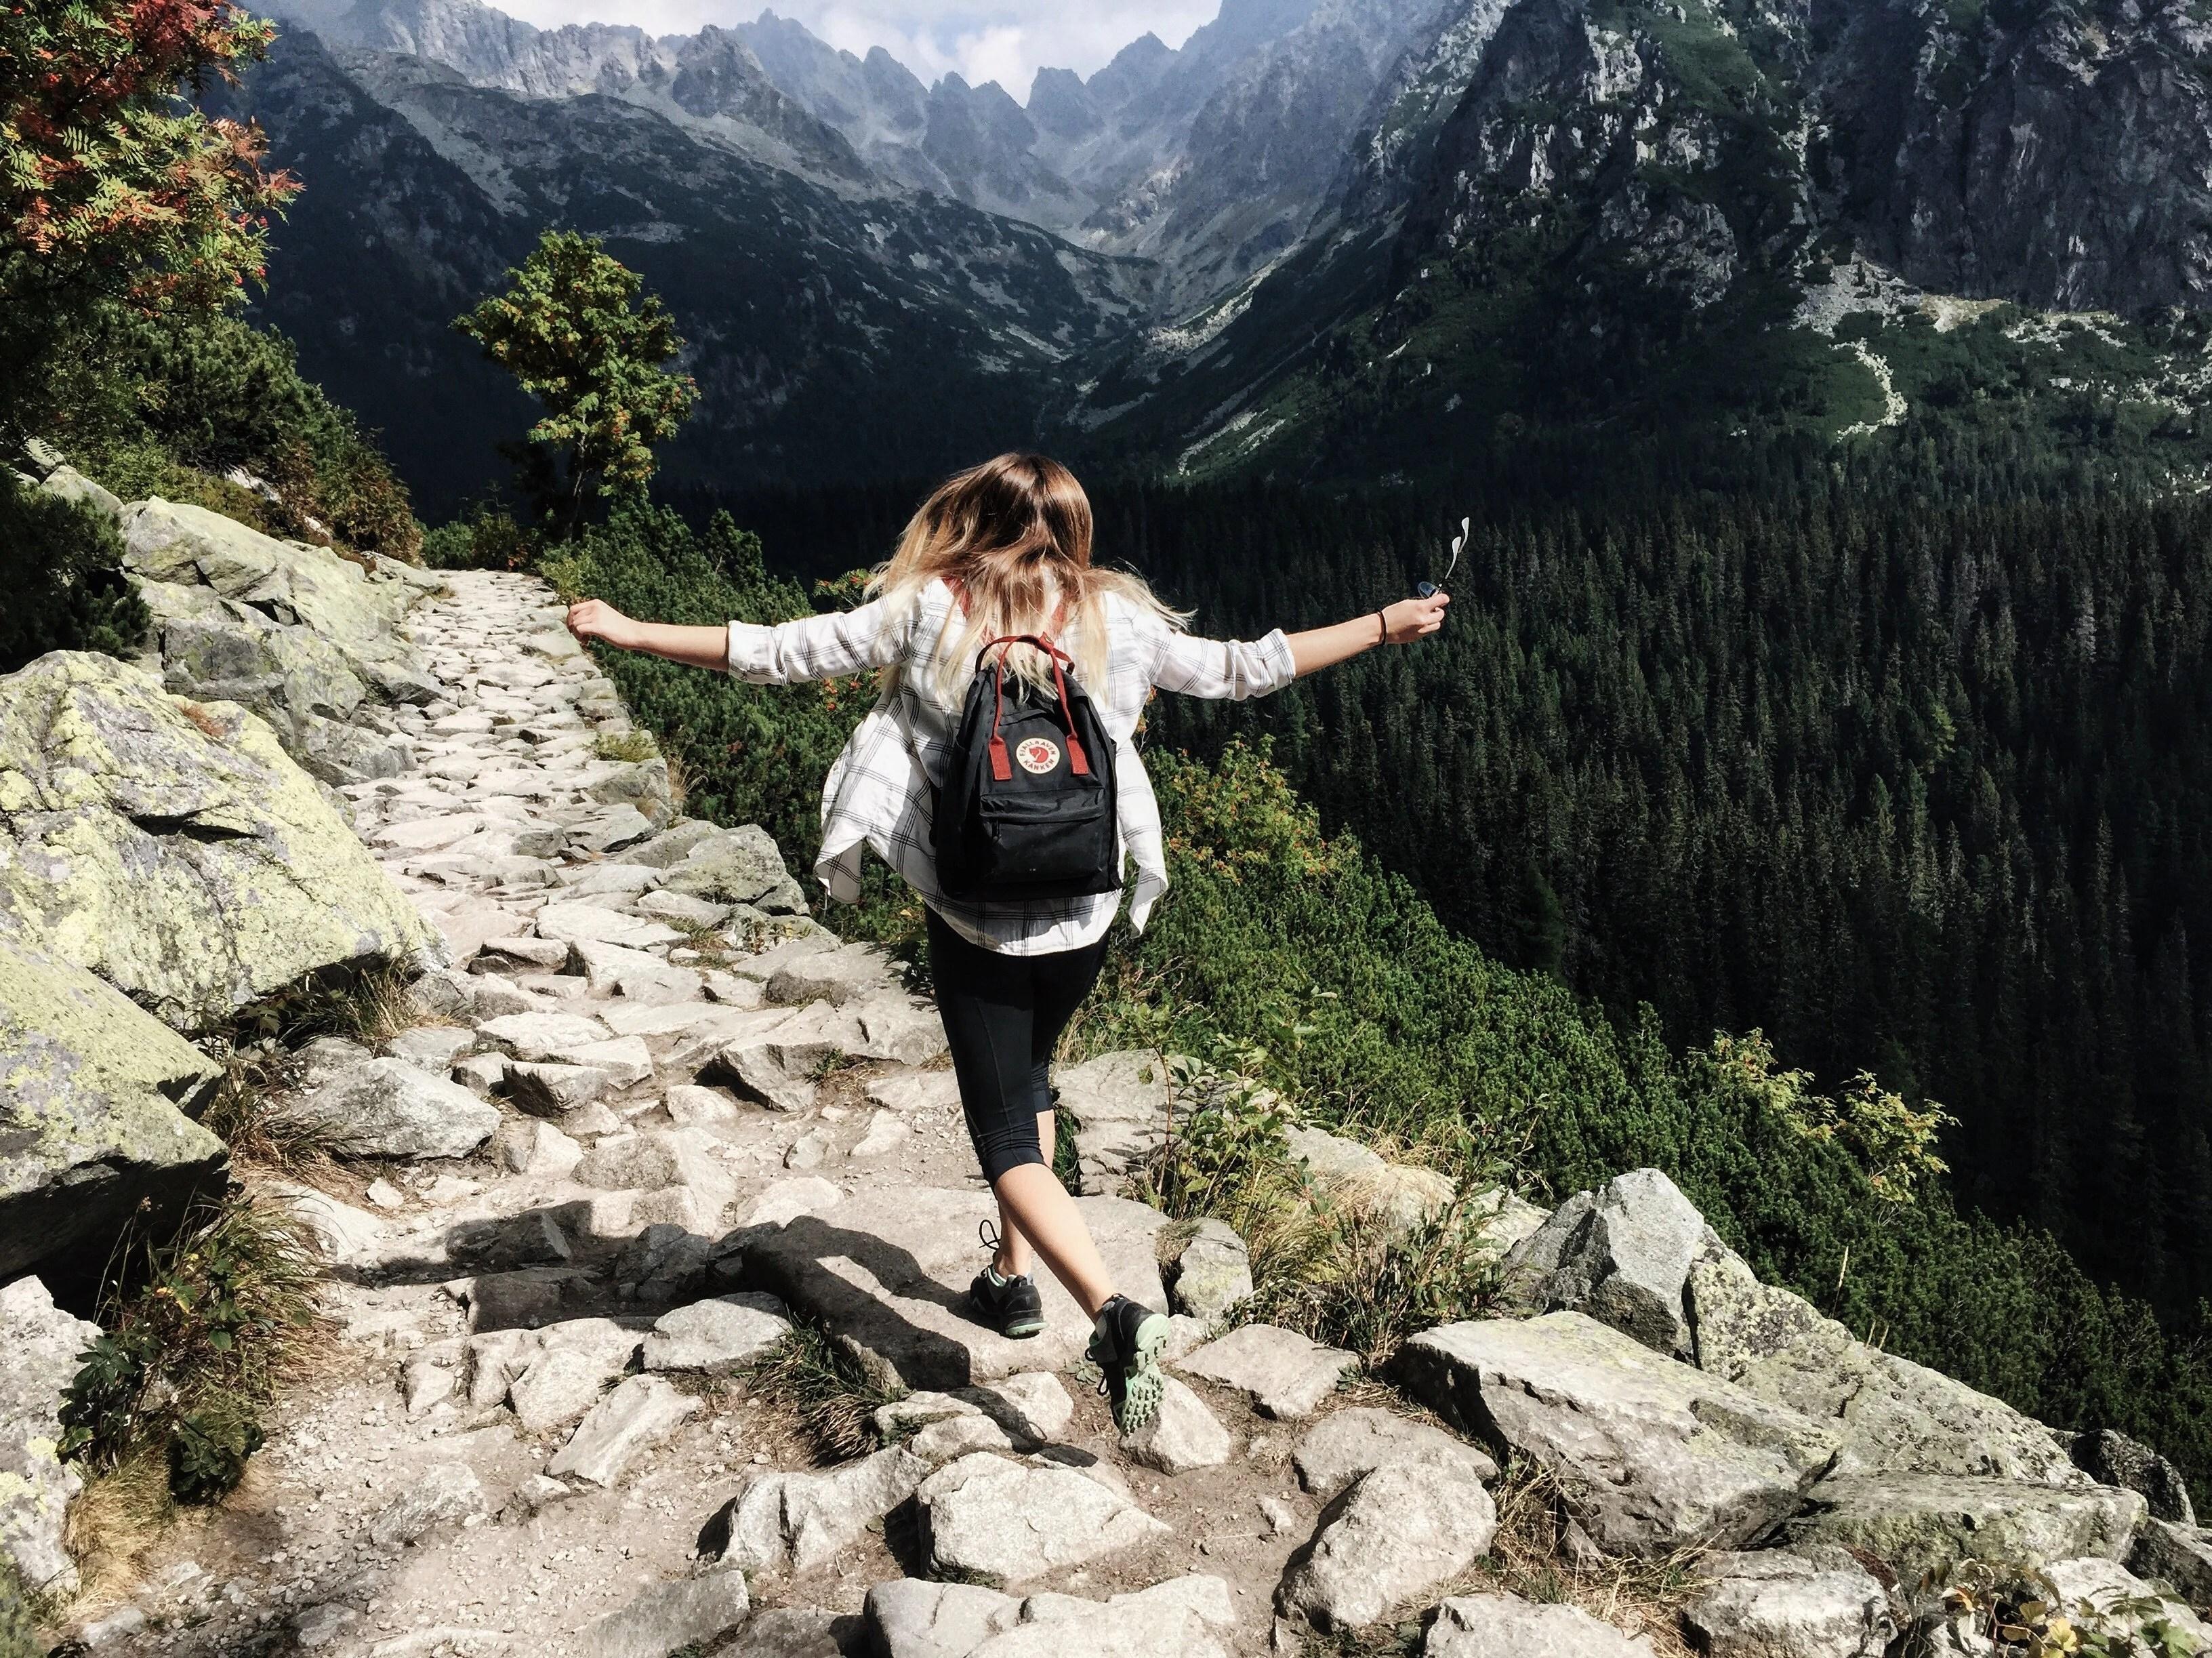 https://www.pexels.com/photo/adult-adventure-beautiful-climb-287240/